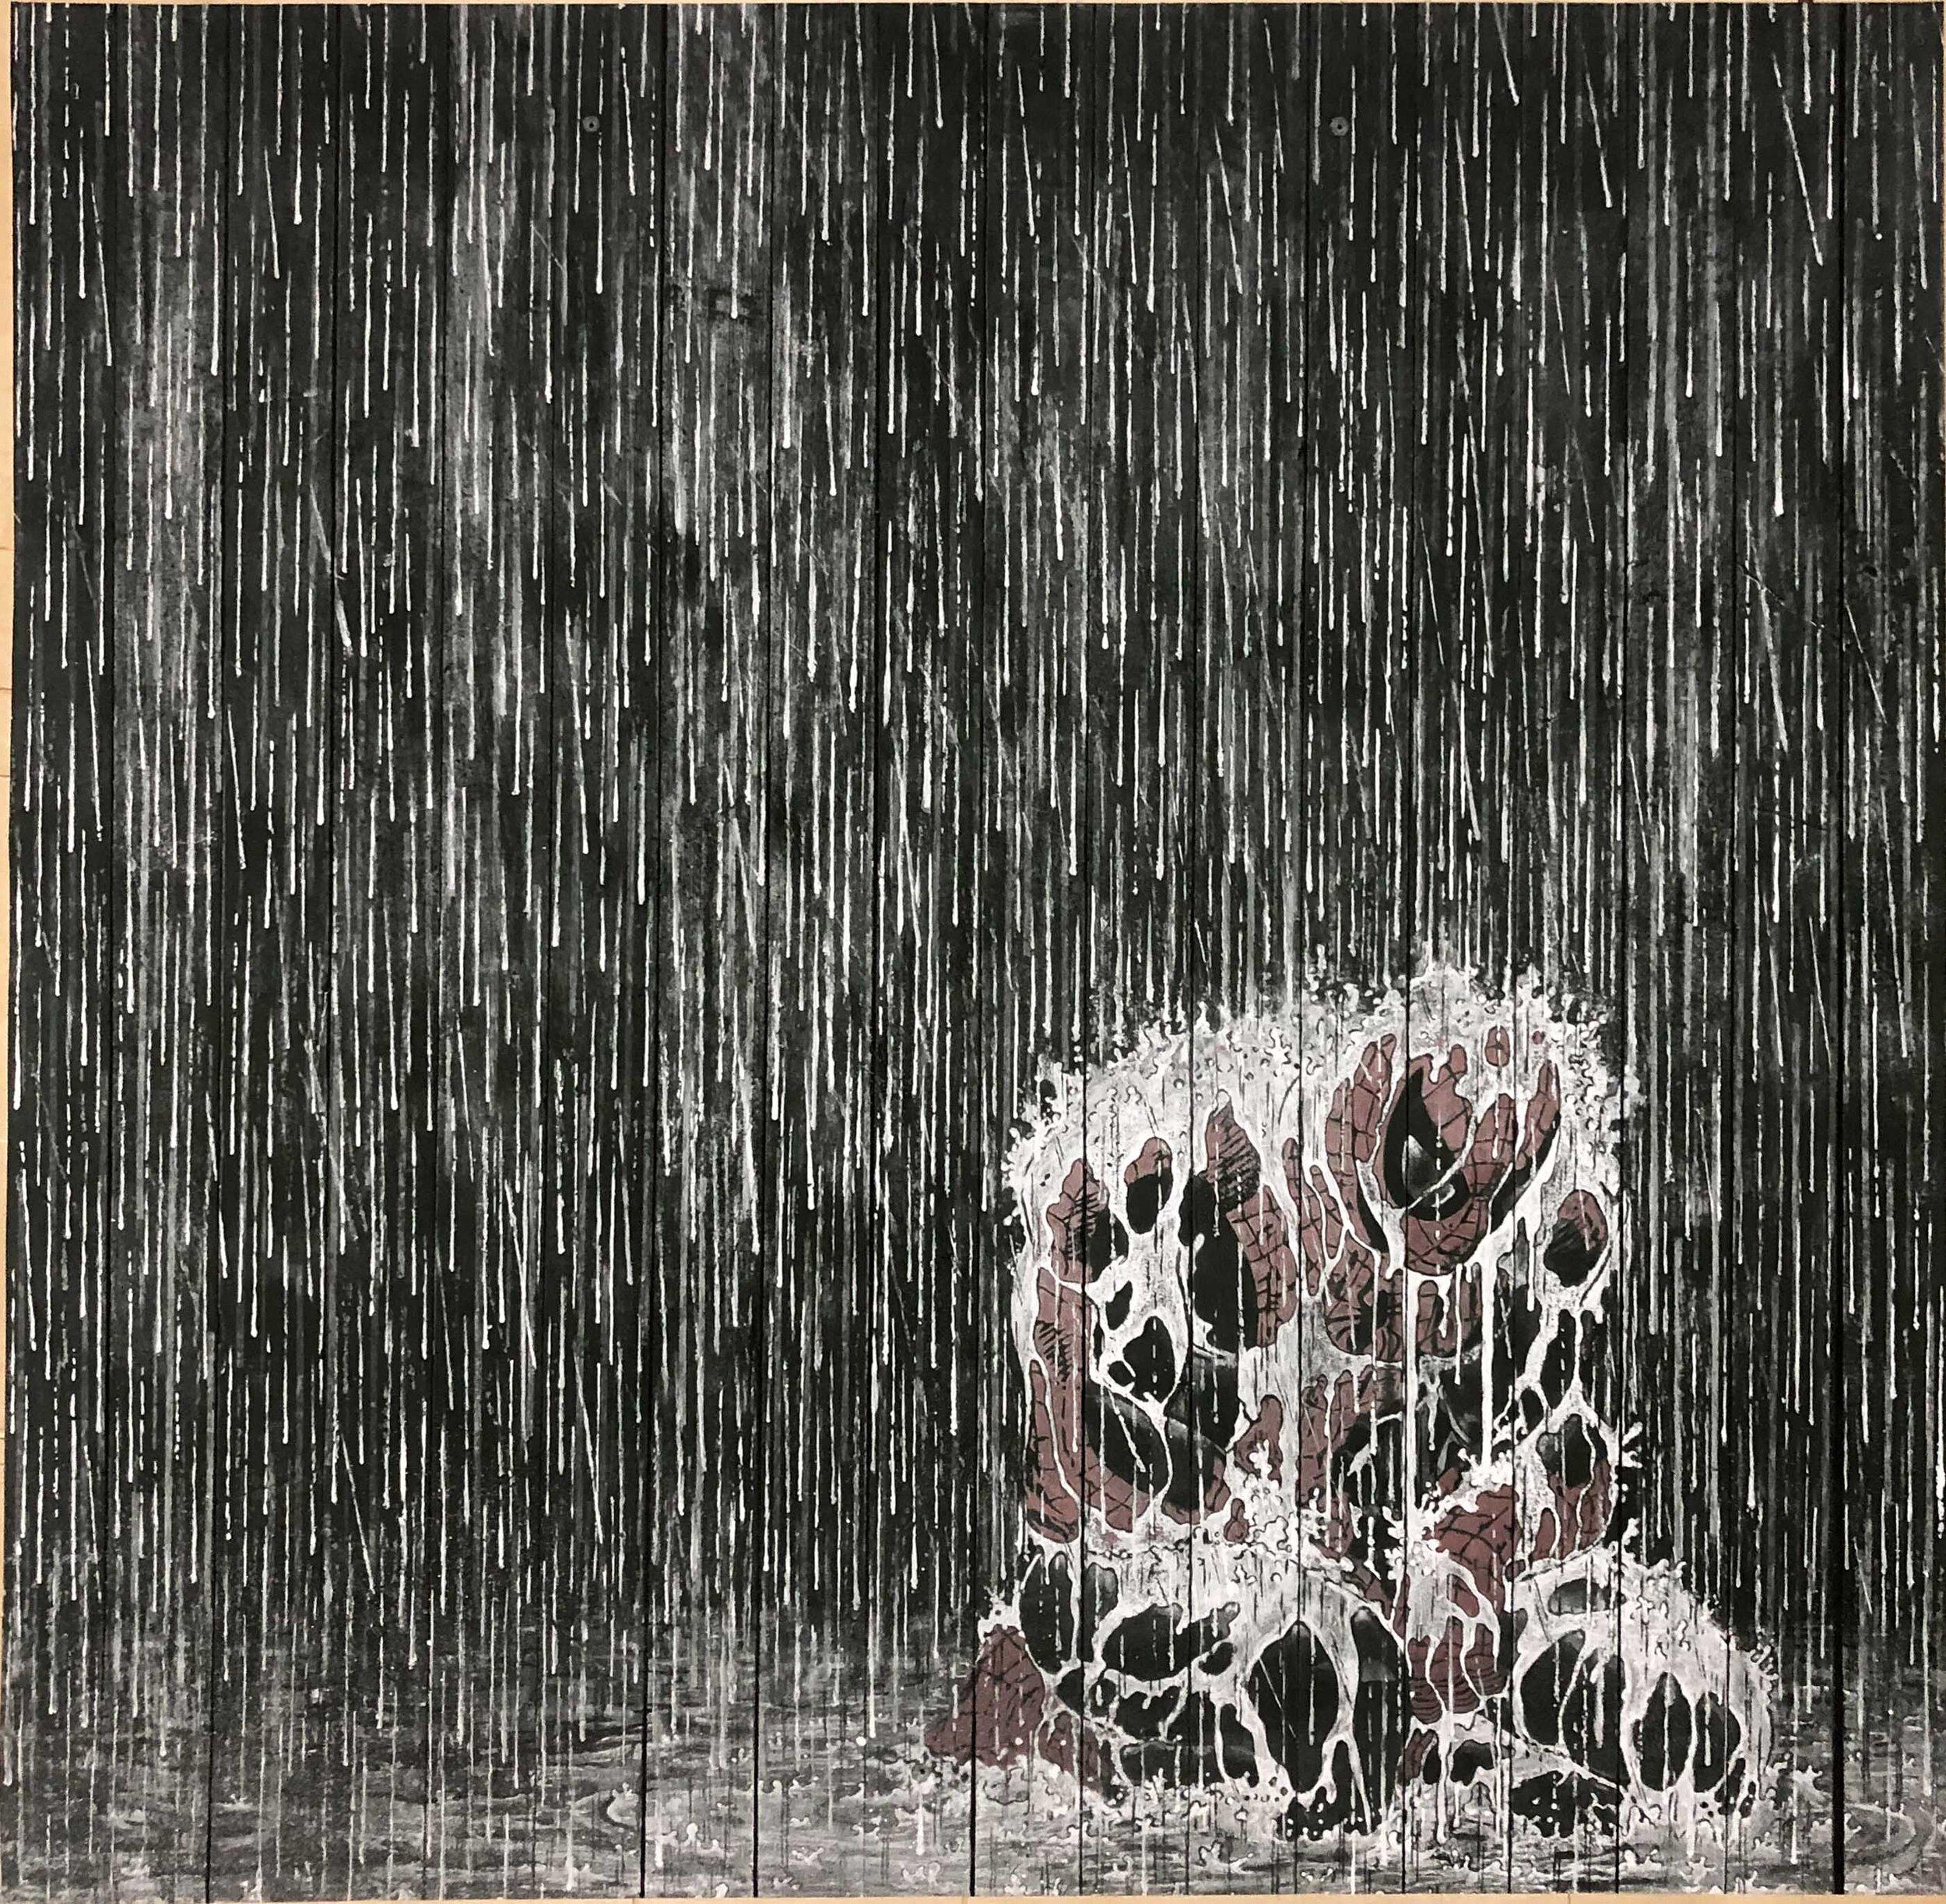 HPM_down_came_the_rain.jpg